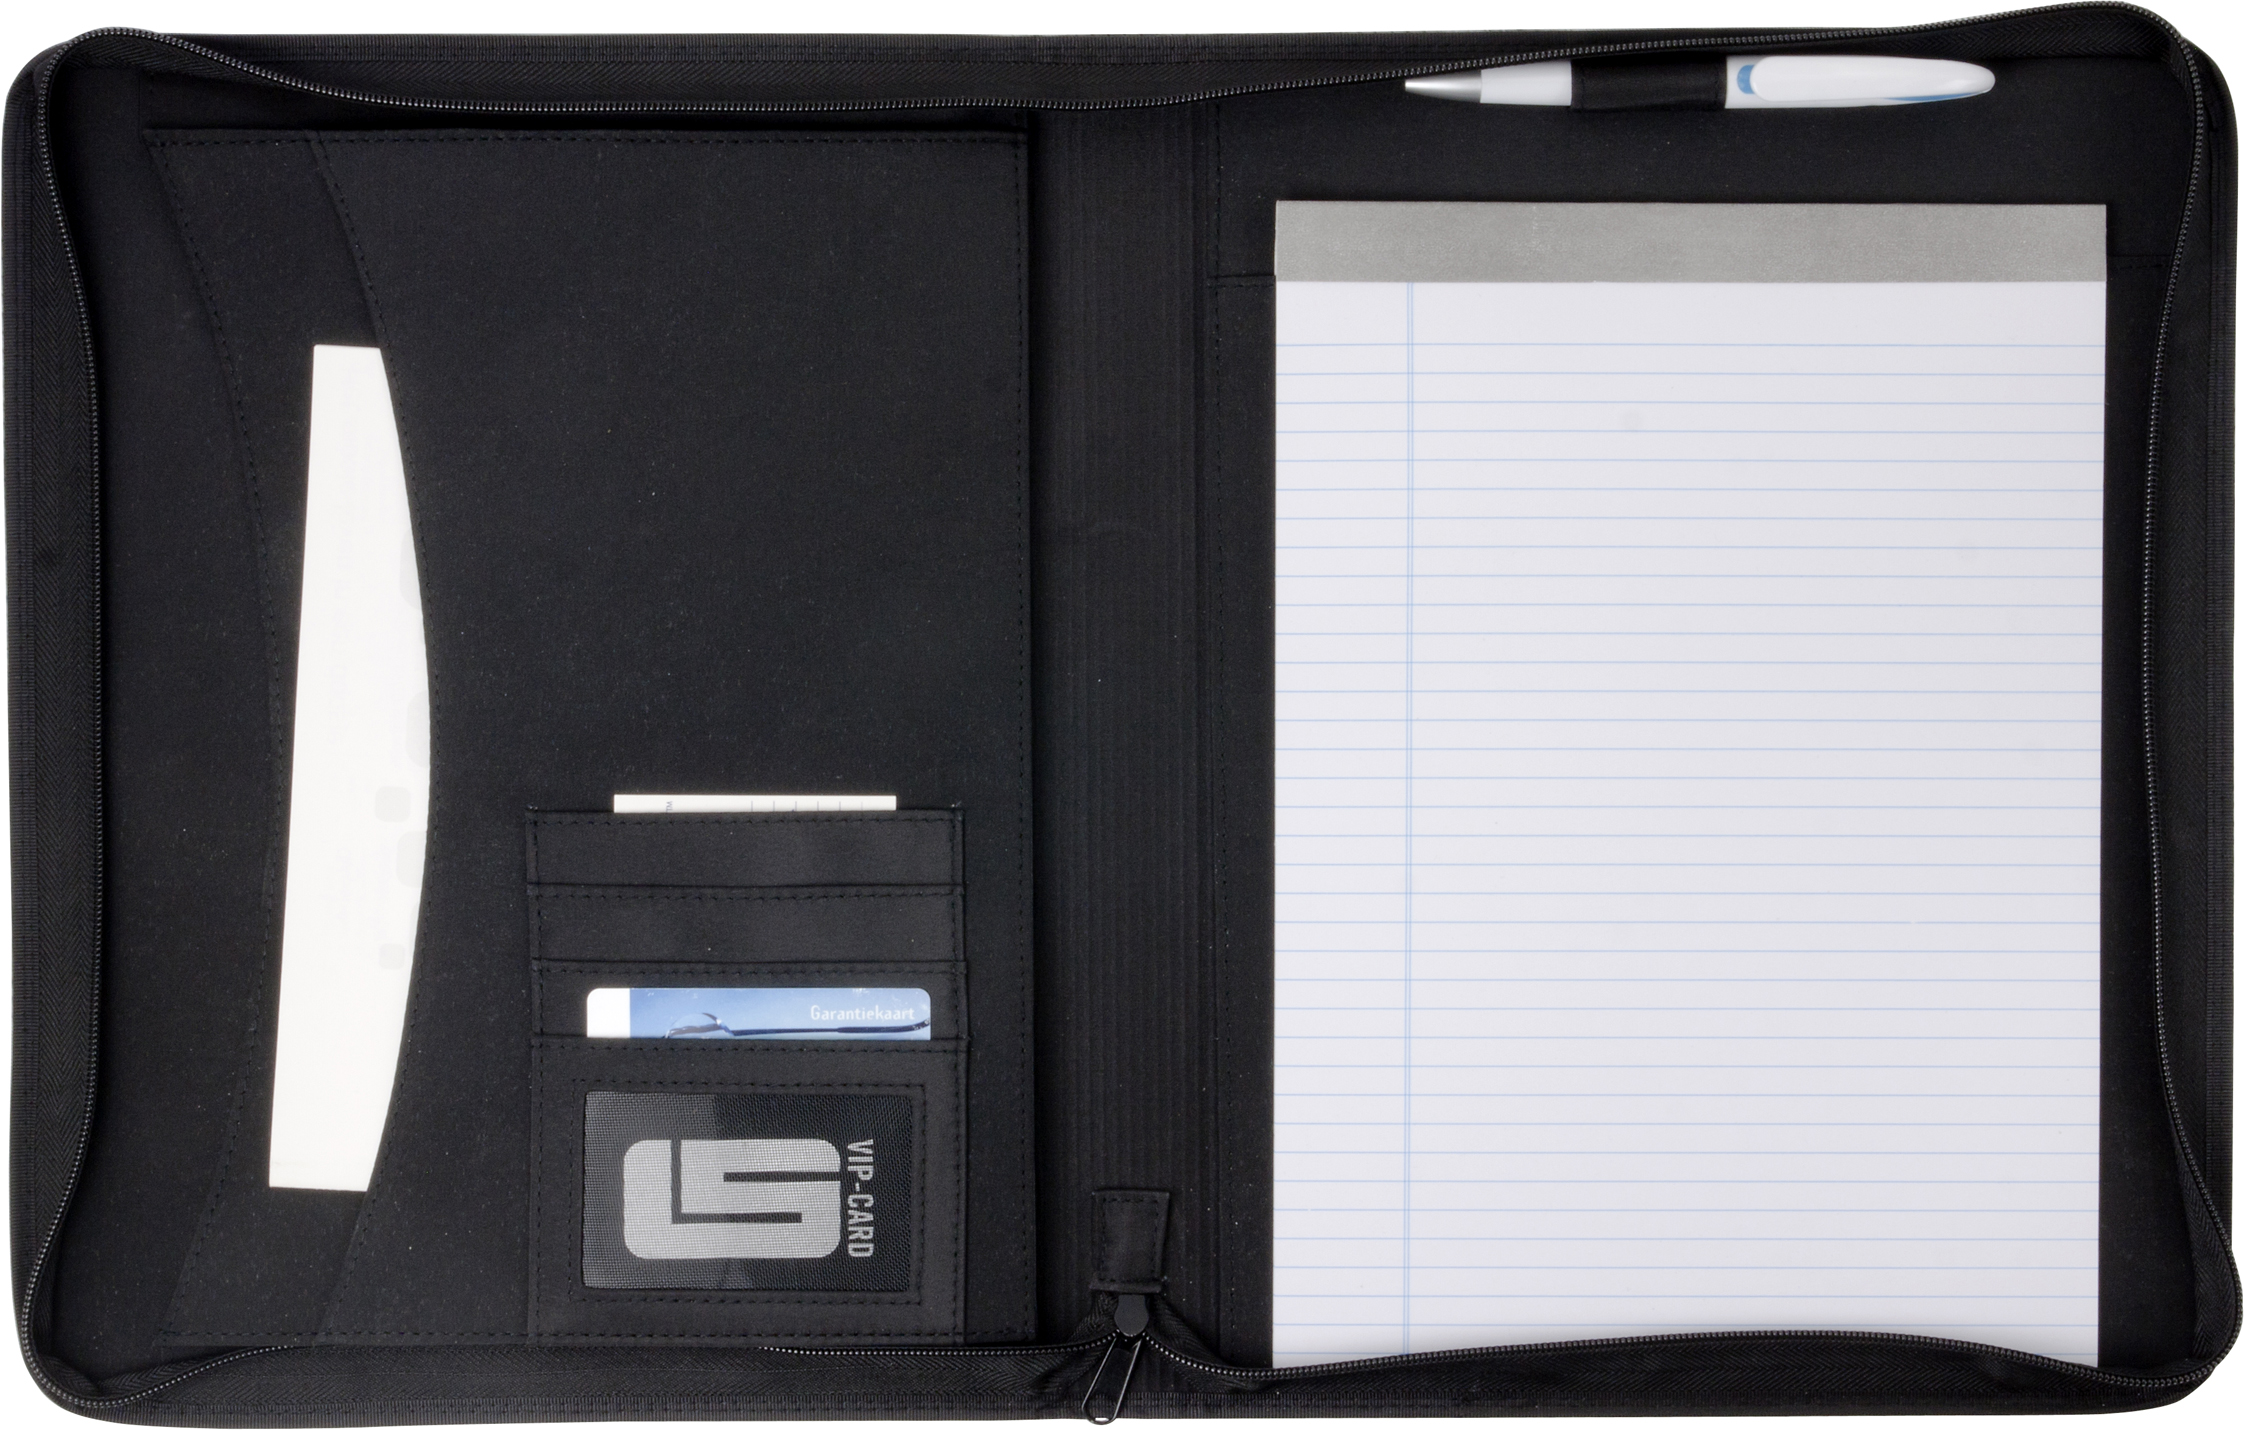 Promotional A4 Zipped PVC folder.